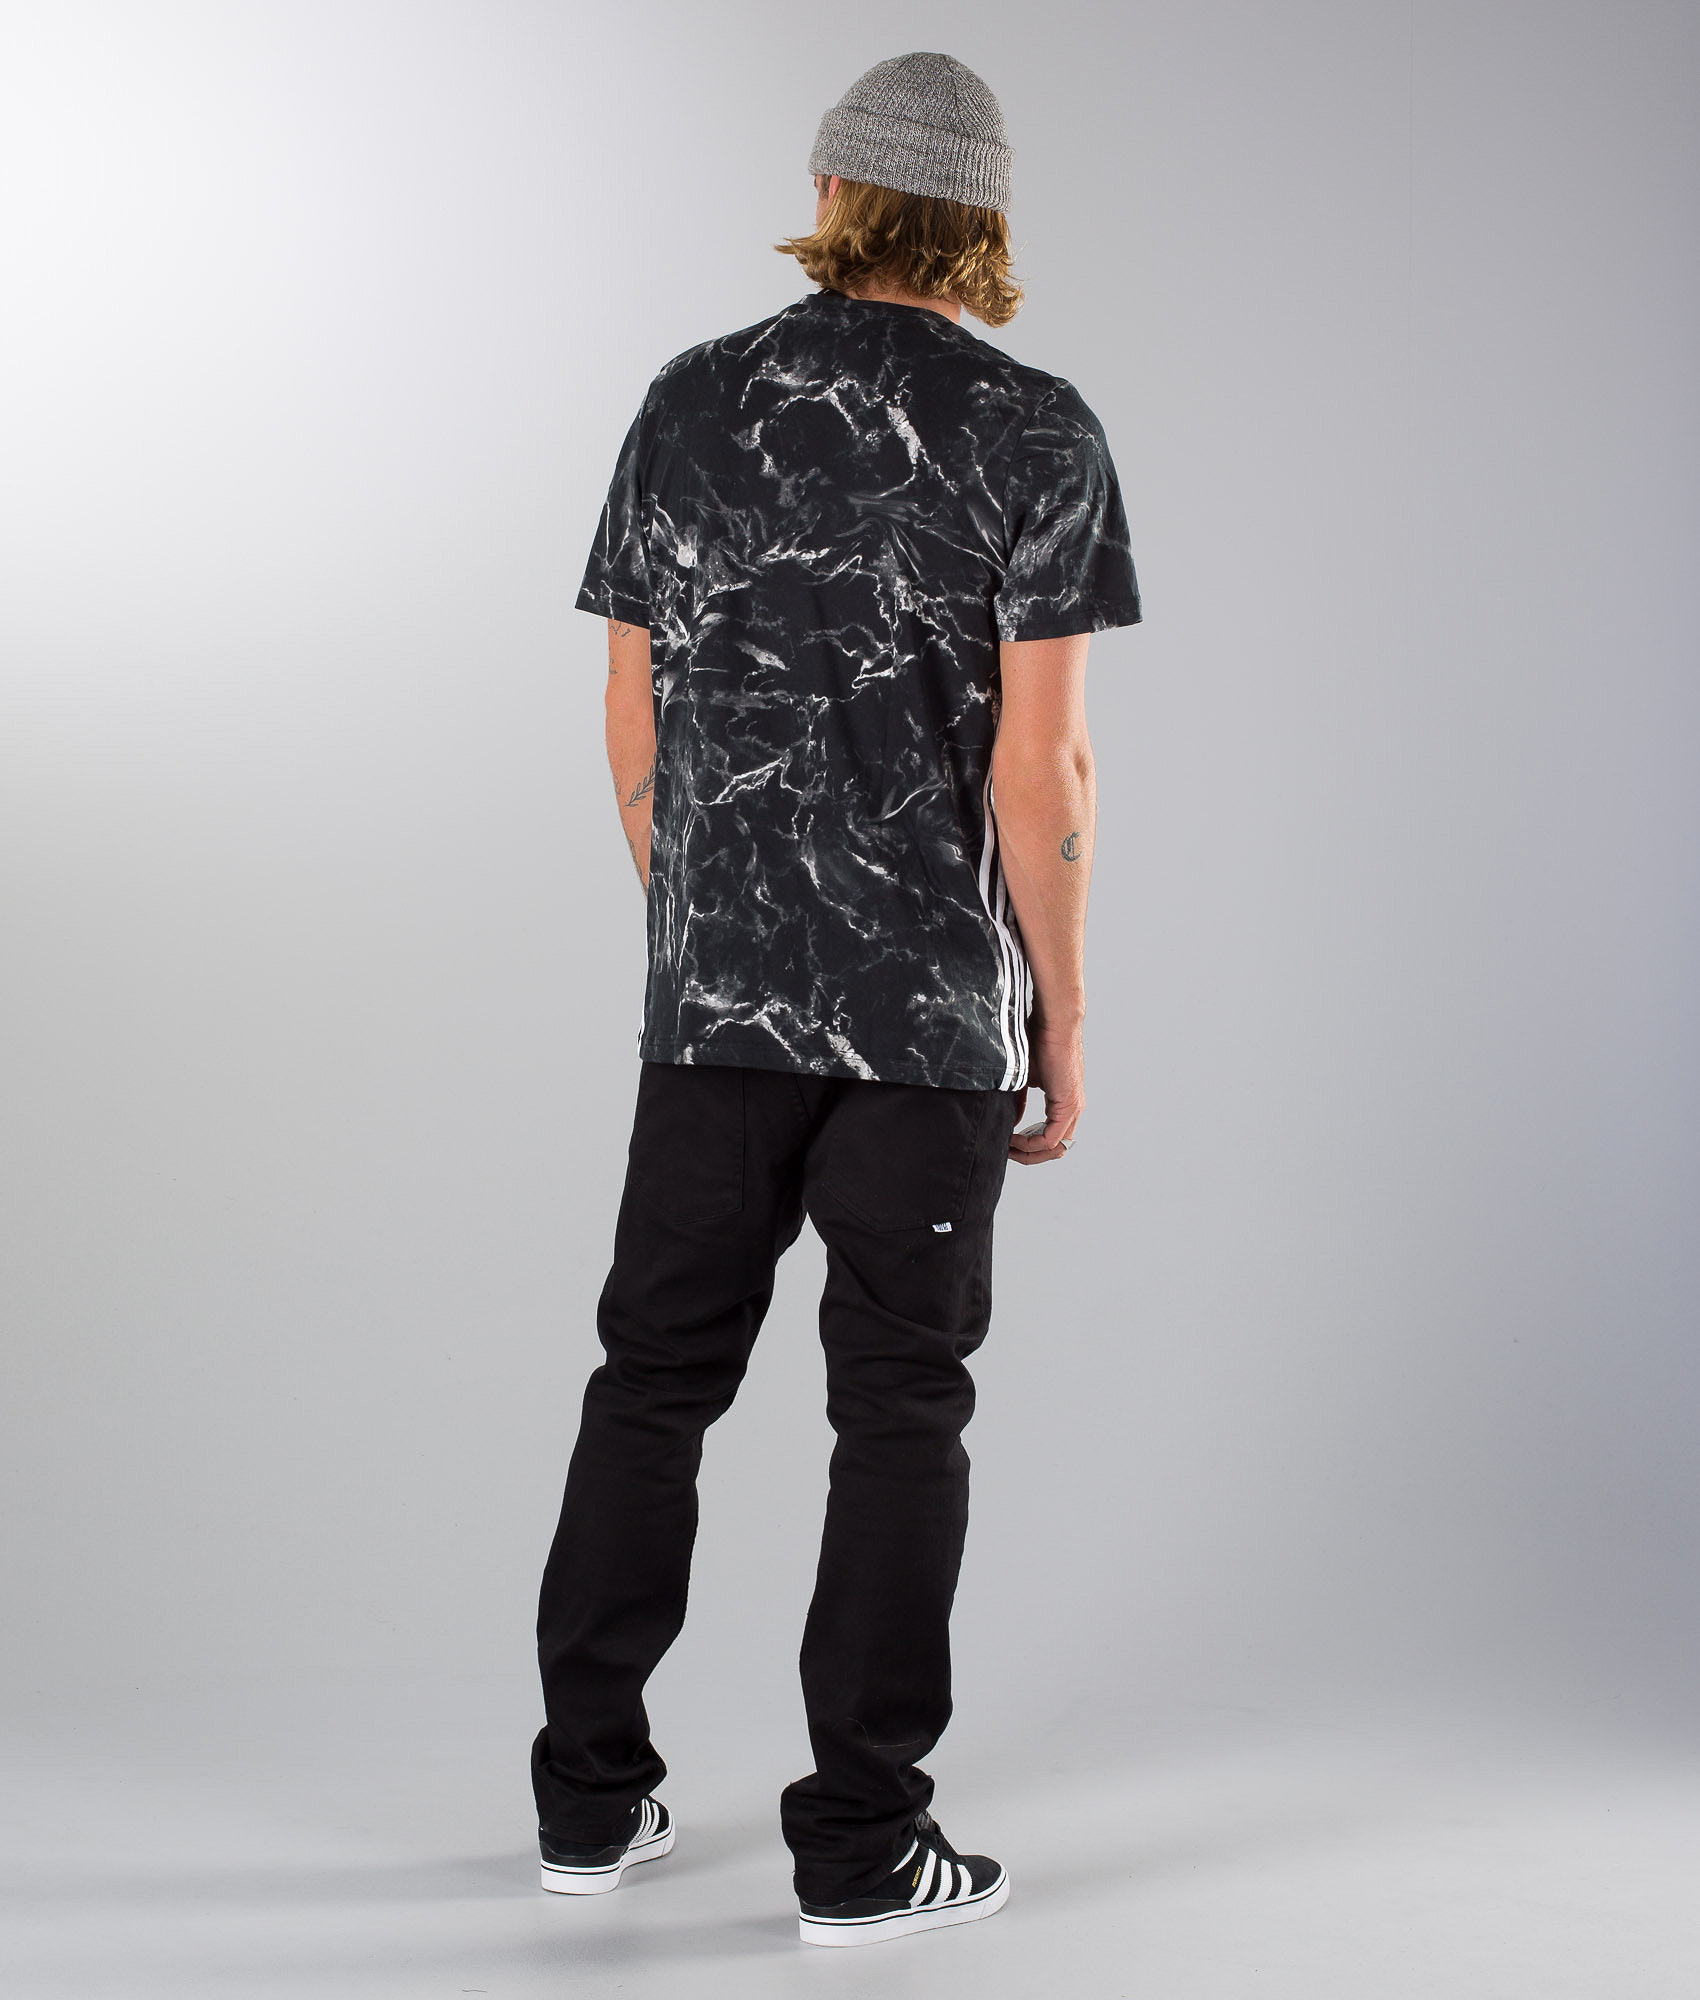 6d8fb4d31b20 Adidas Skateboarding Marble Stripe T-shirt Black White - Ridestore.com